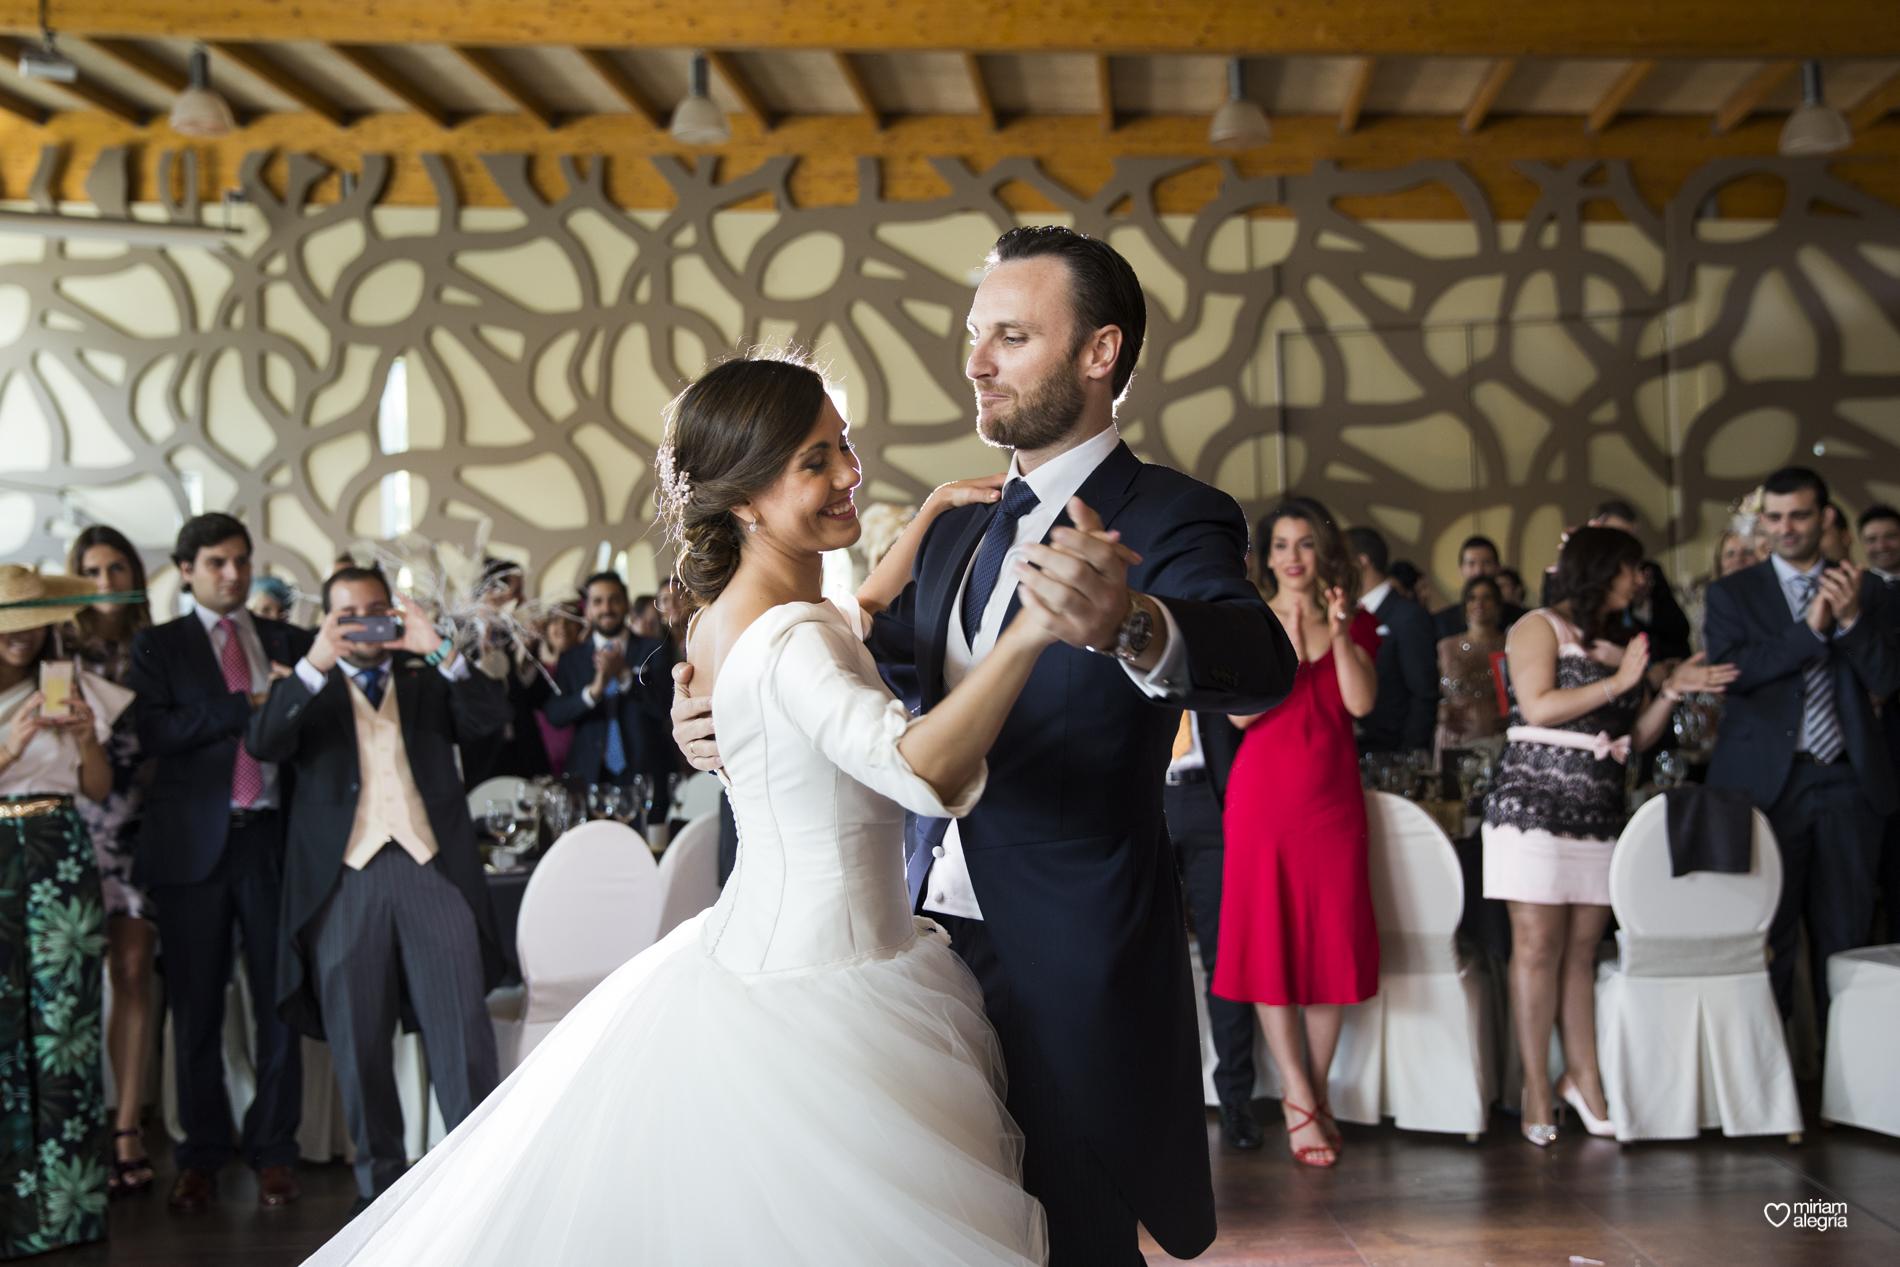 boda-en-la-catedral-de-murcia-miriam-alegria-fotografos-boda-murcia-75